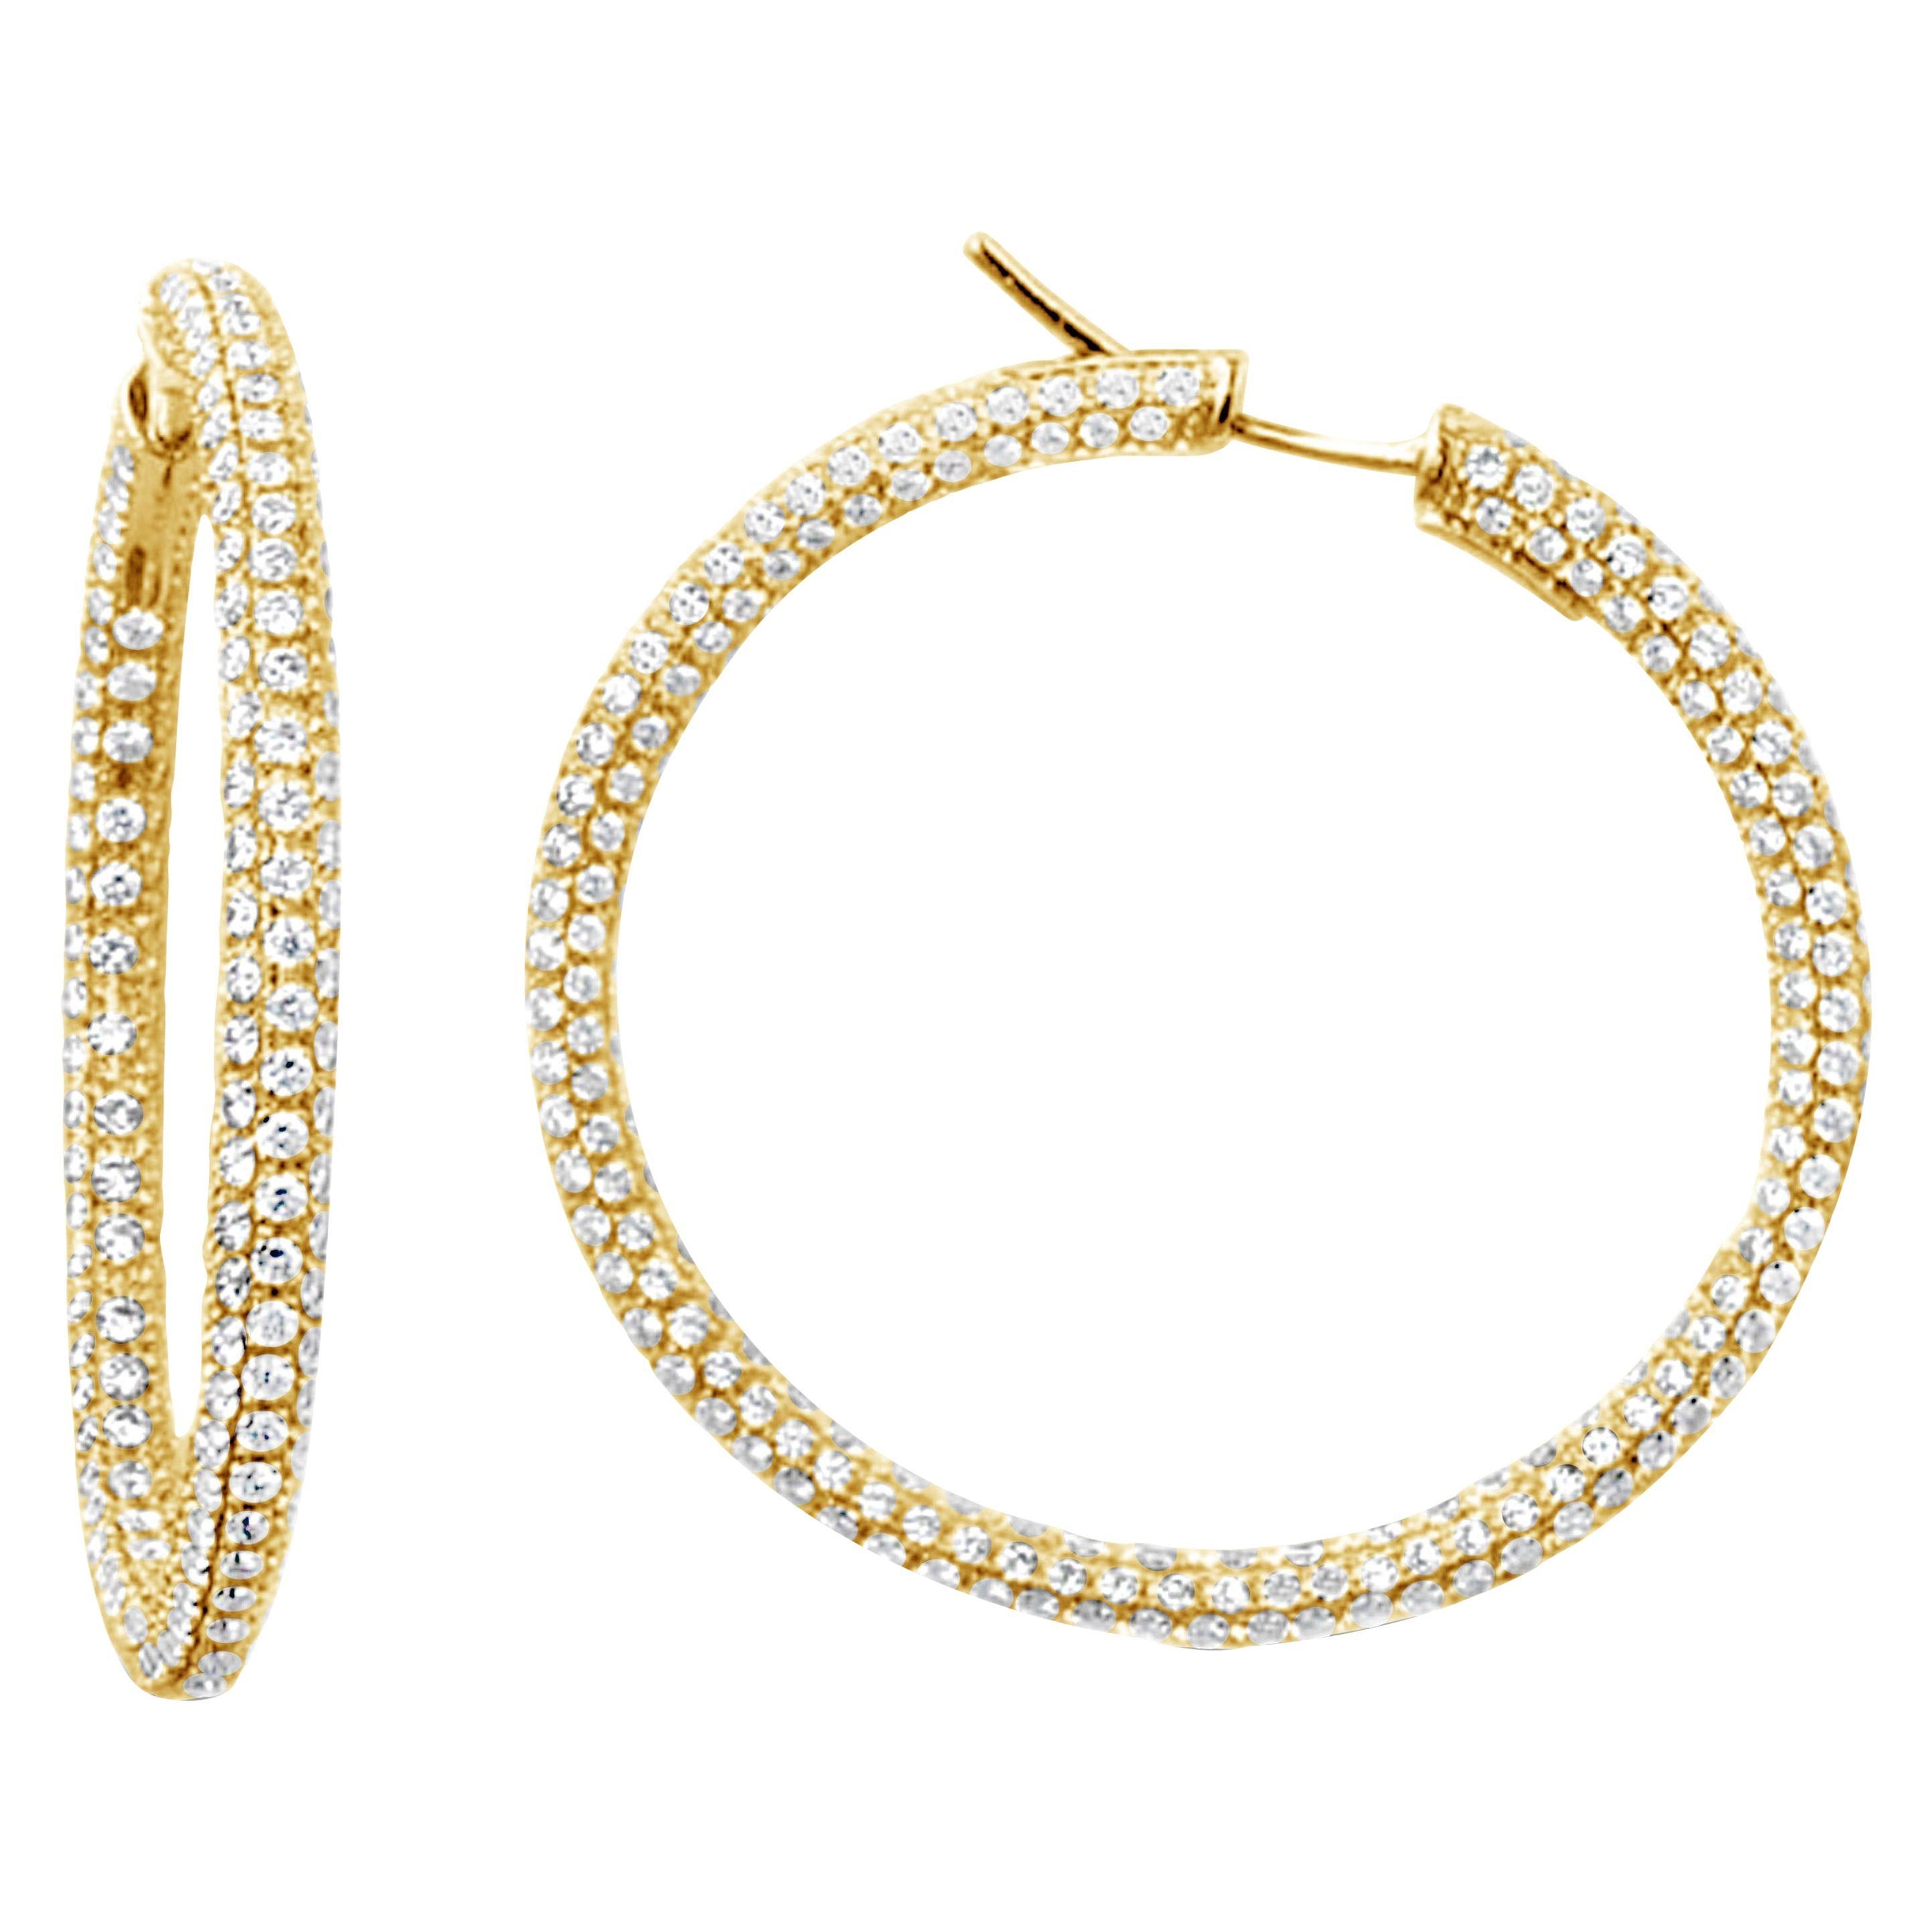 Garavelli 18 Karat Yellow Gold Diamond Eternity Hoop Earrings